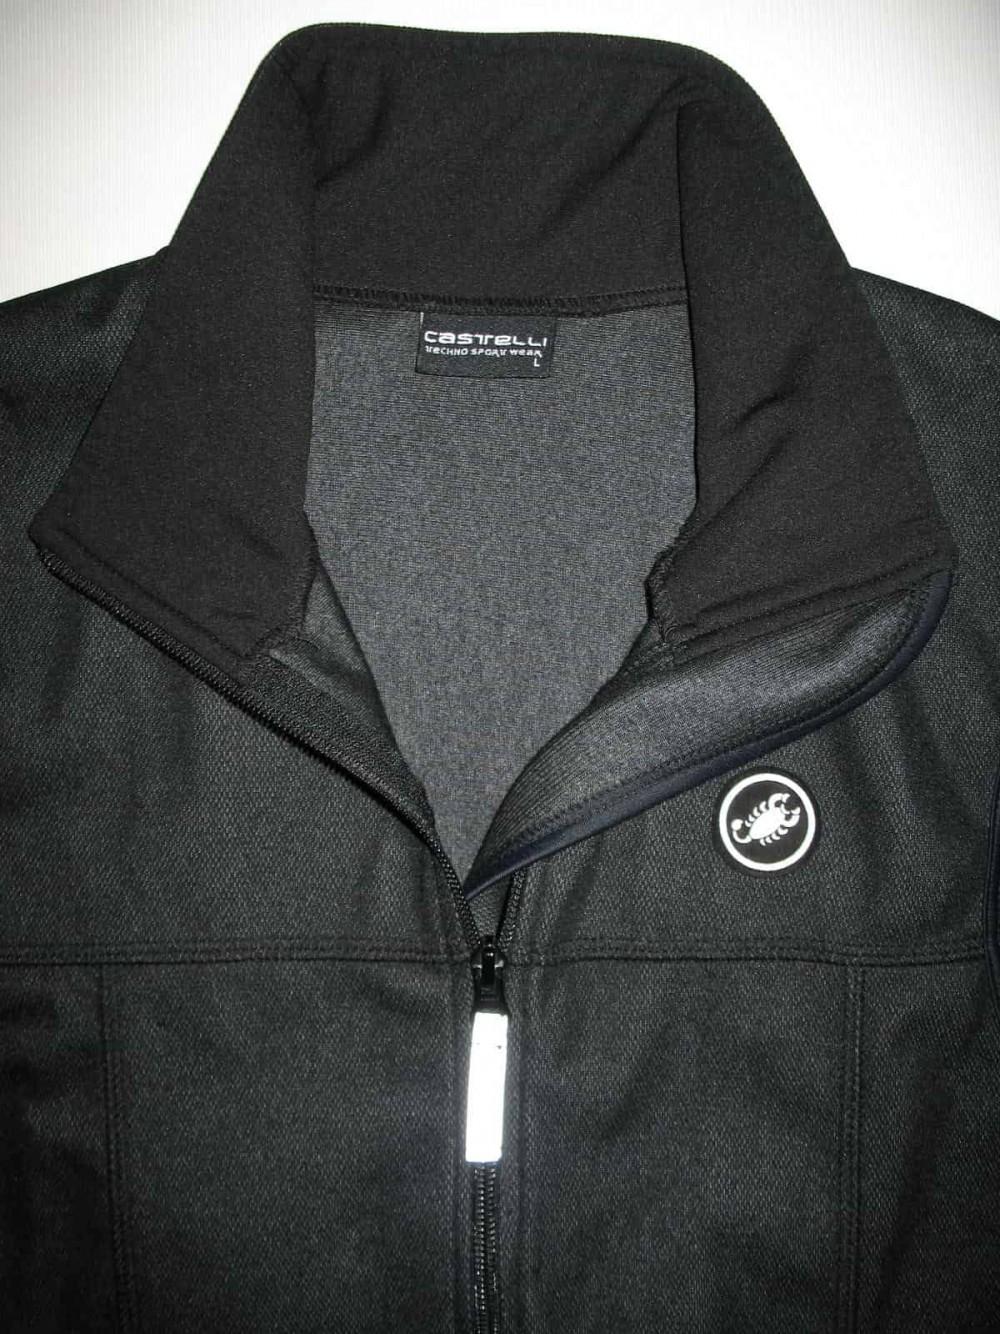 Жилет CASTELLI windstopper vest (размер L) - 2